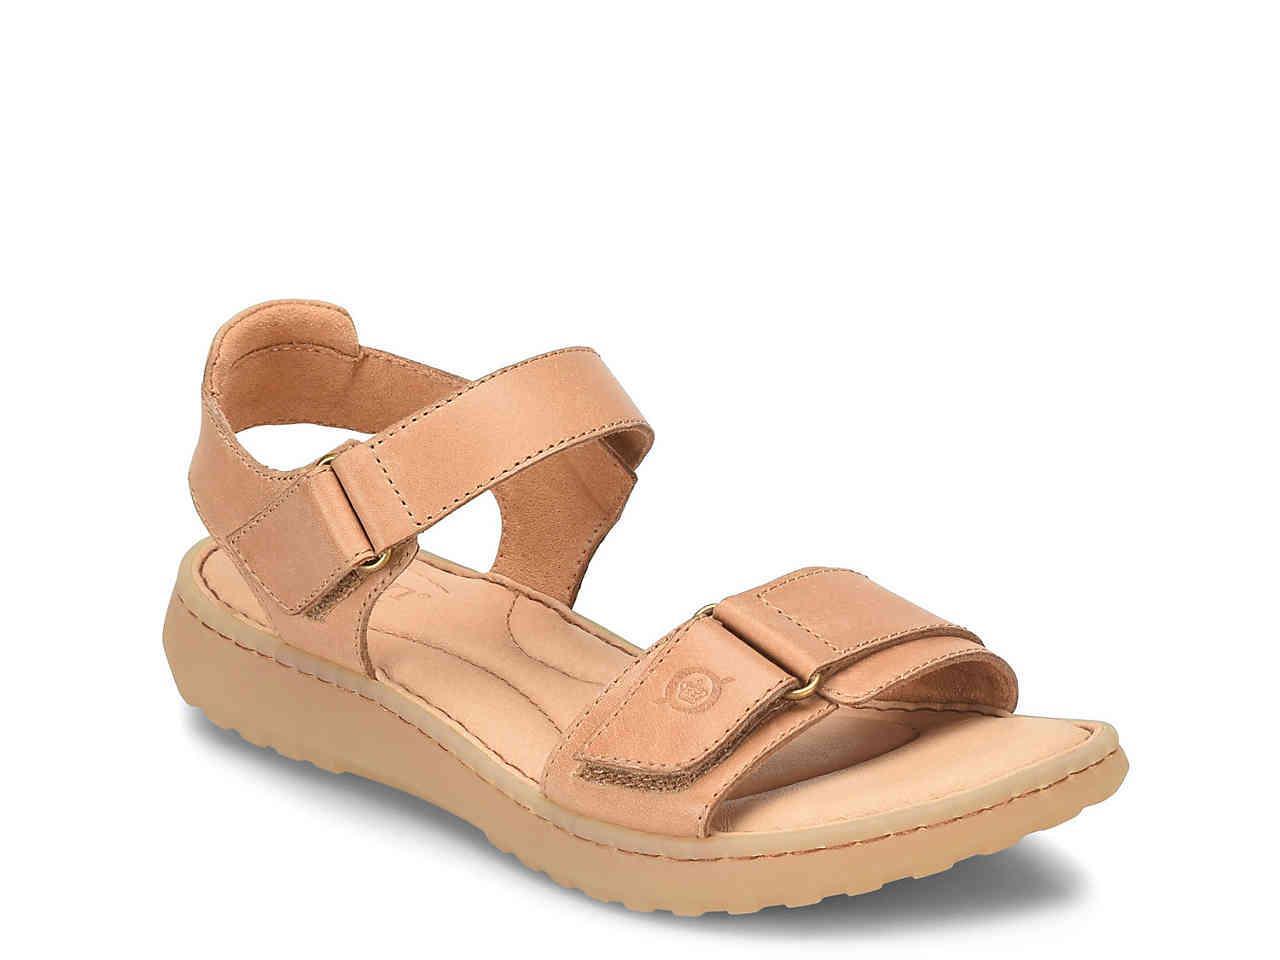 944c82acd11e Lyst - Born Haldor Sandal in Brown